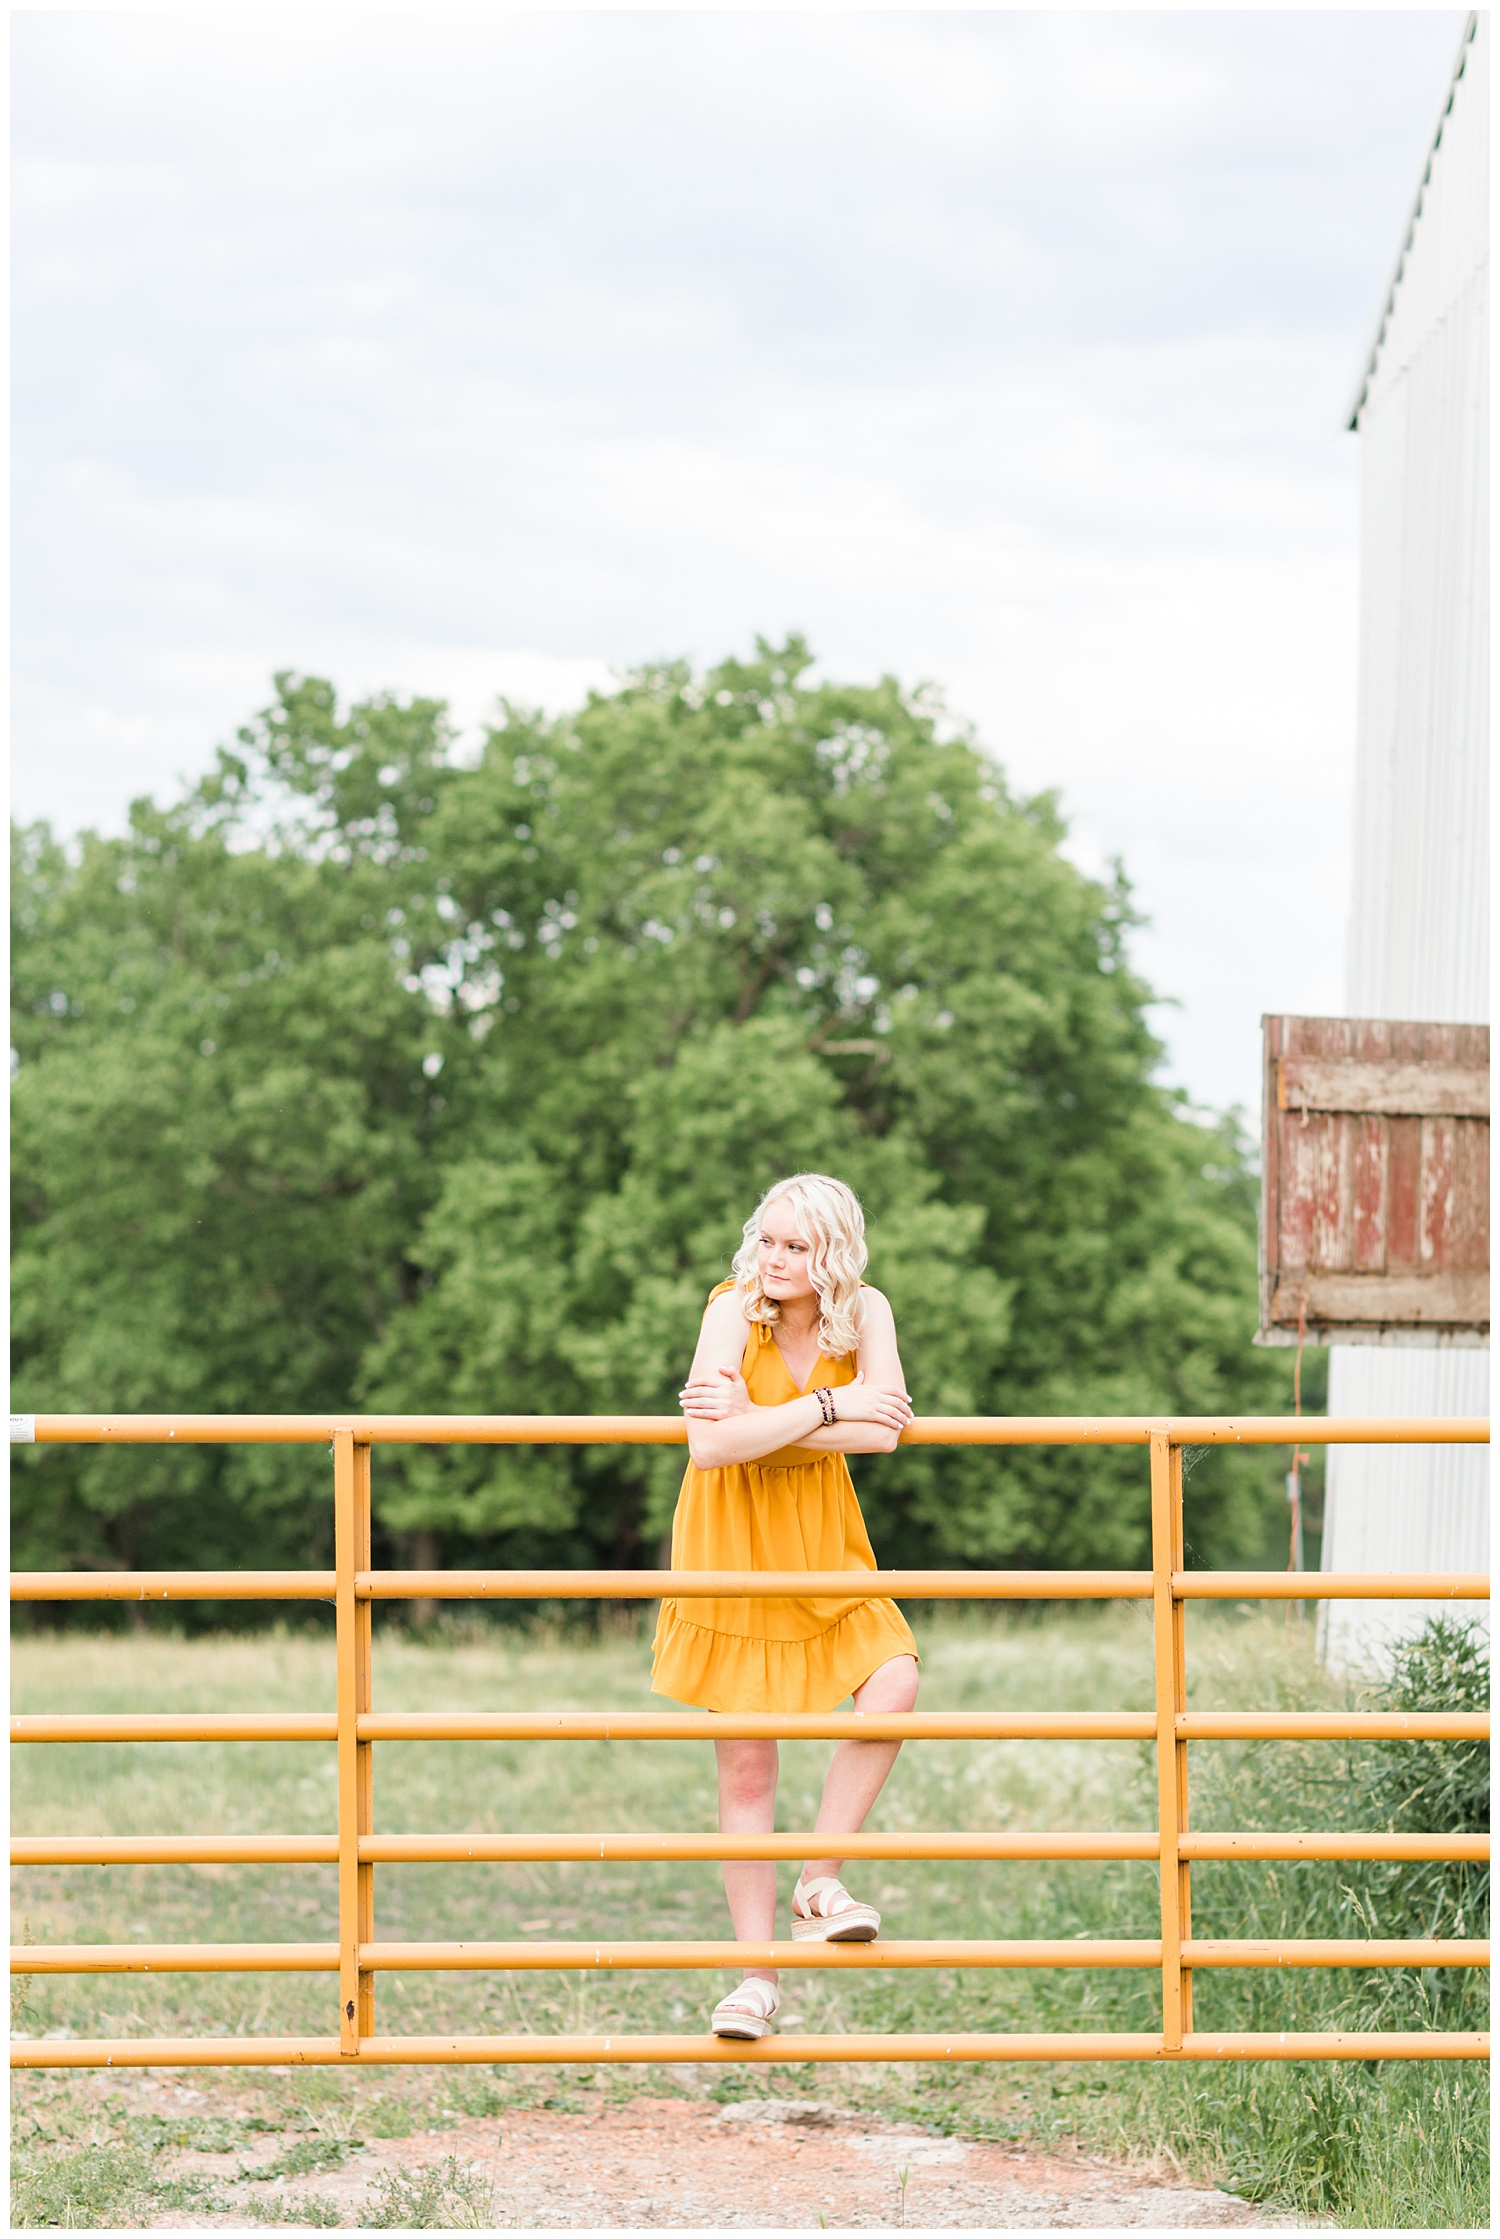 Senior girl Molly wearing a yellow dress climbing a cattle gate   CB Studio